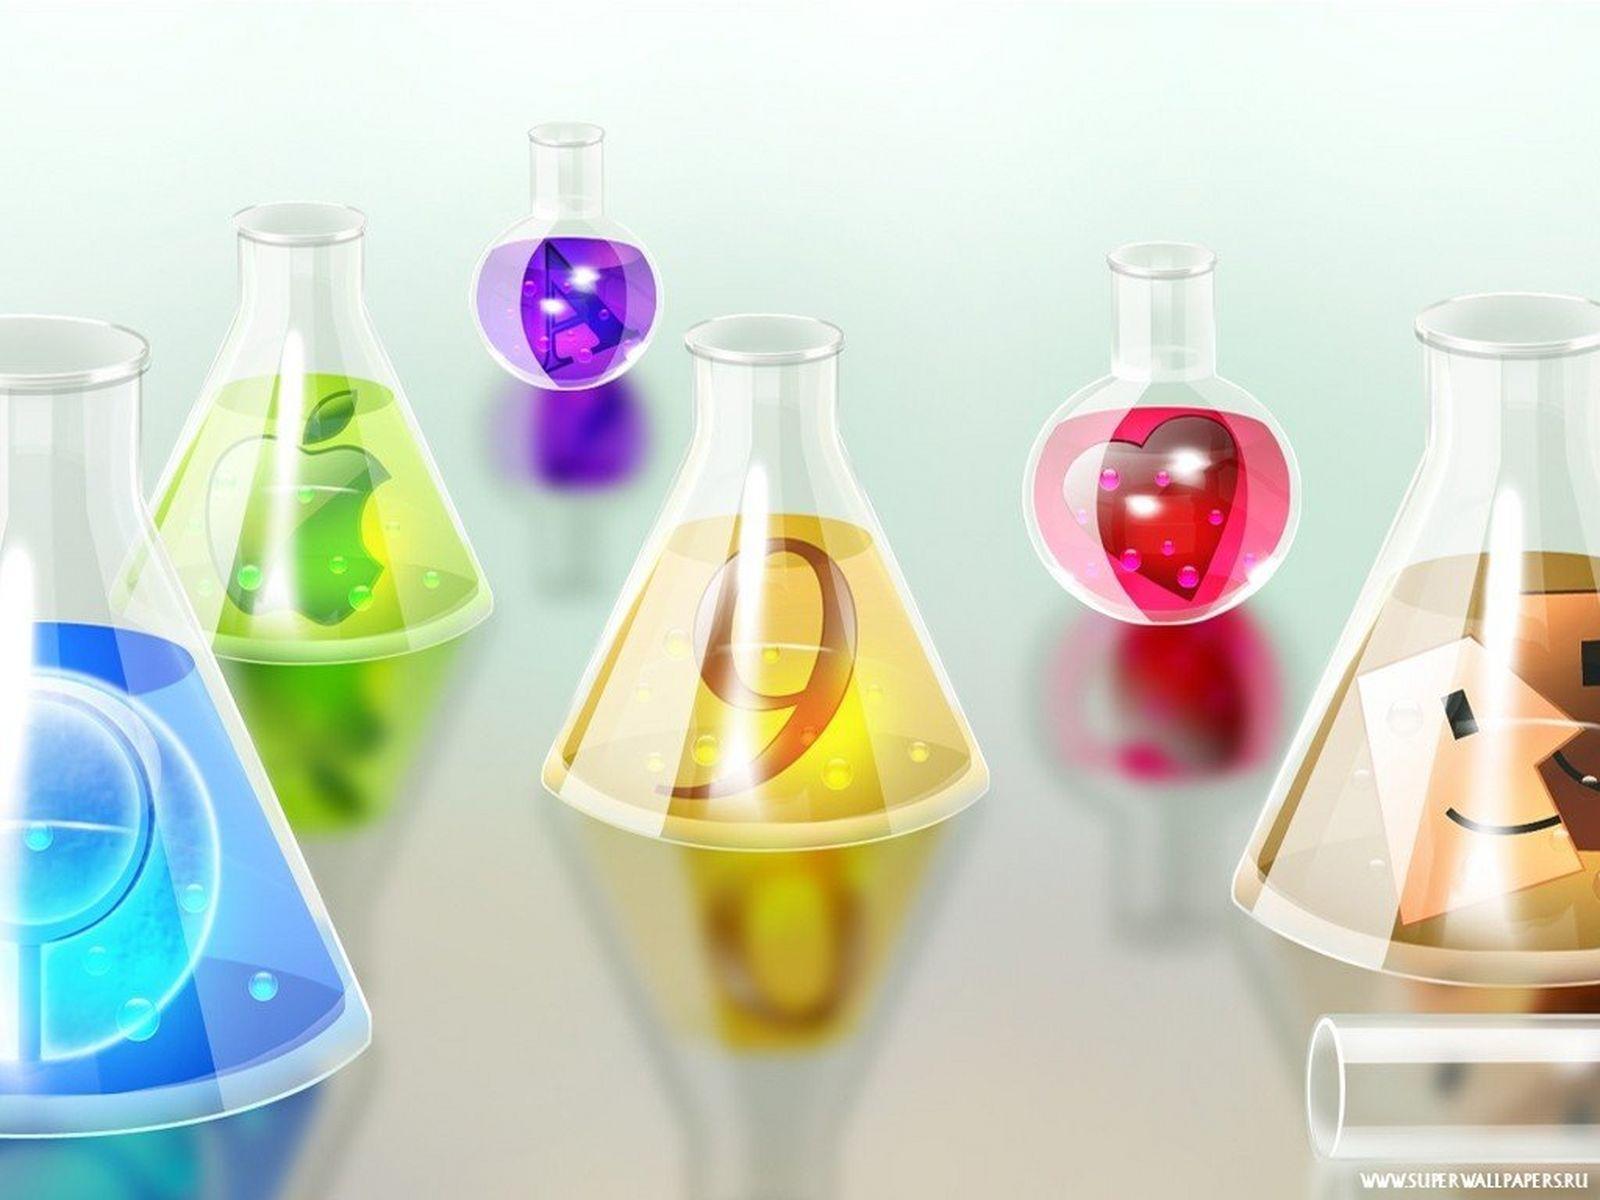 Pin by GuRdEEp Singh on 3D Glass Imaginations Glass art